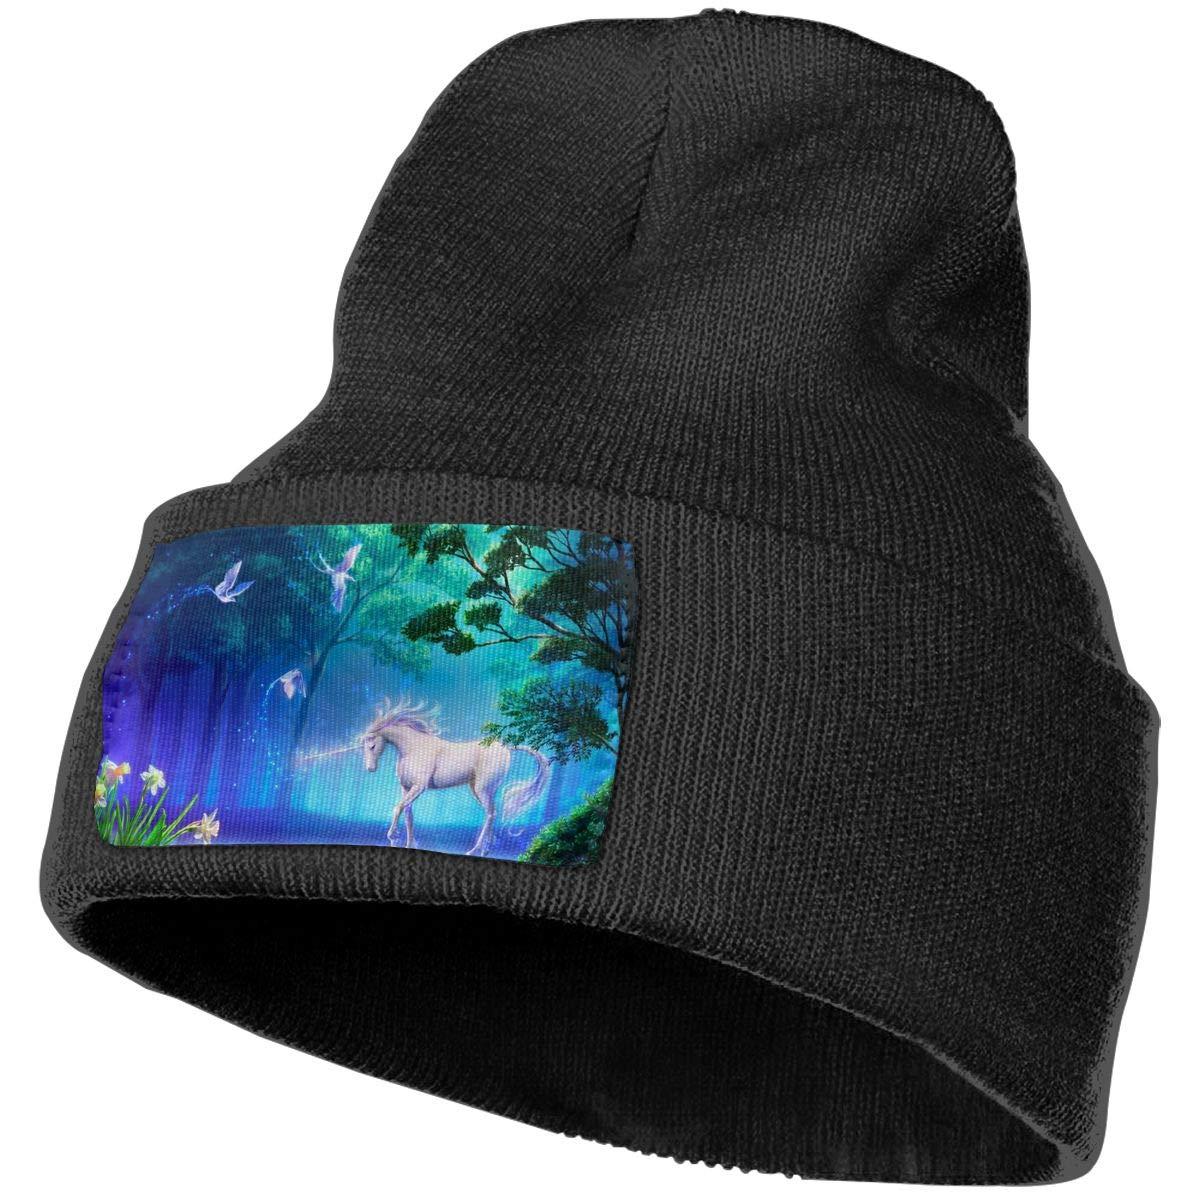 6abbcfcf Black Beanie Hats Beautiful Unicorn Unicorn Unicorn Knit Hedging Cap  Slouchy Winter Warm Skull Caps For Men Womens d0d122